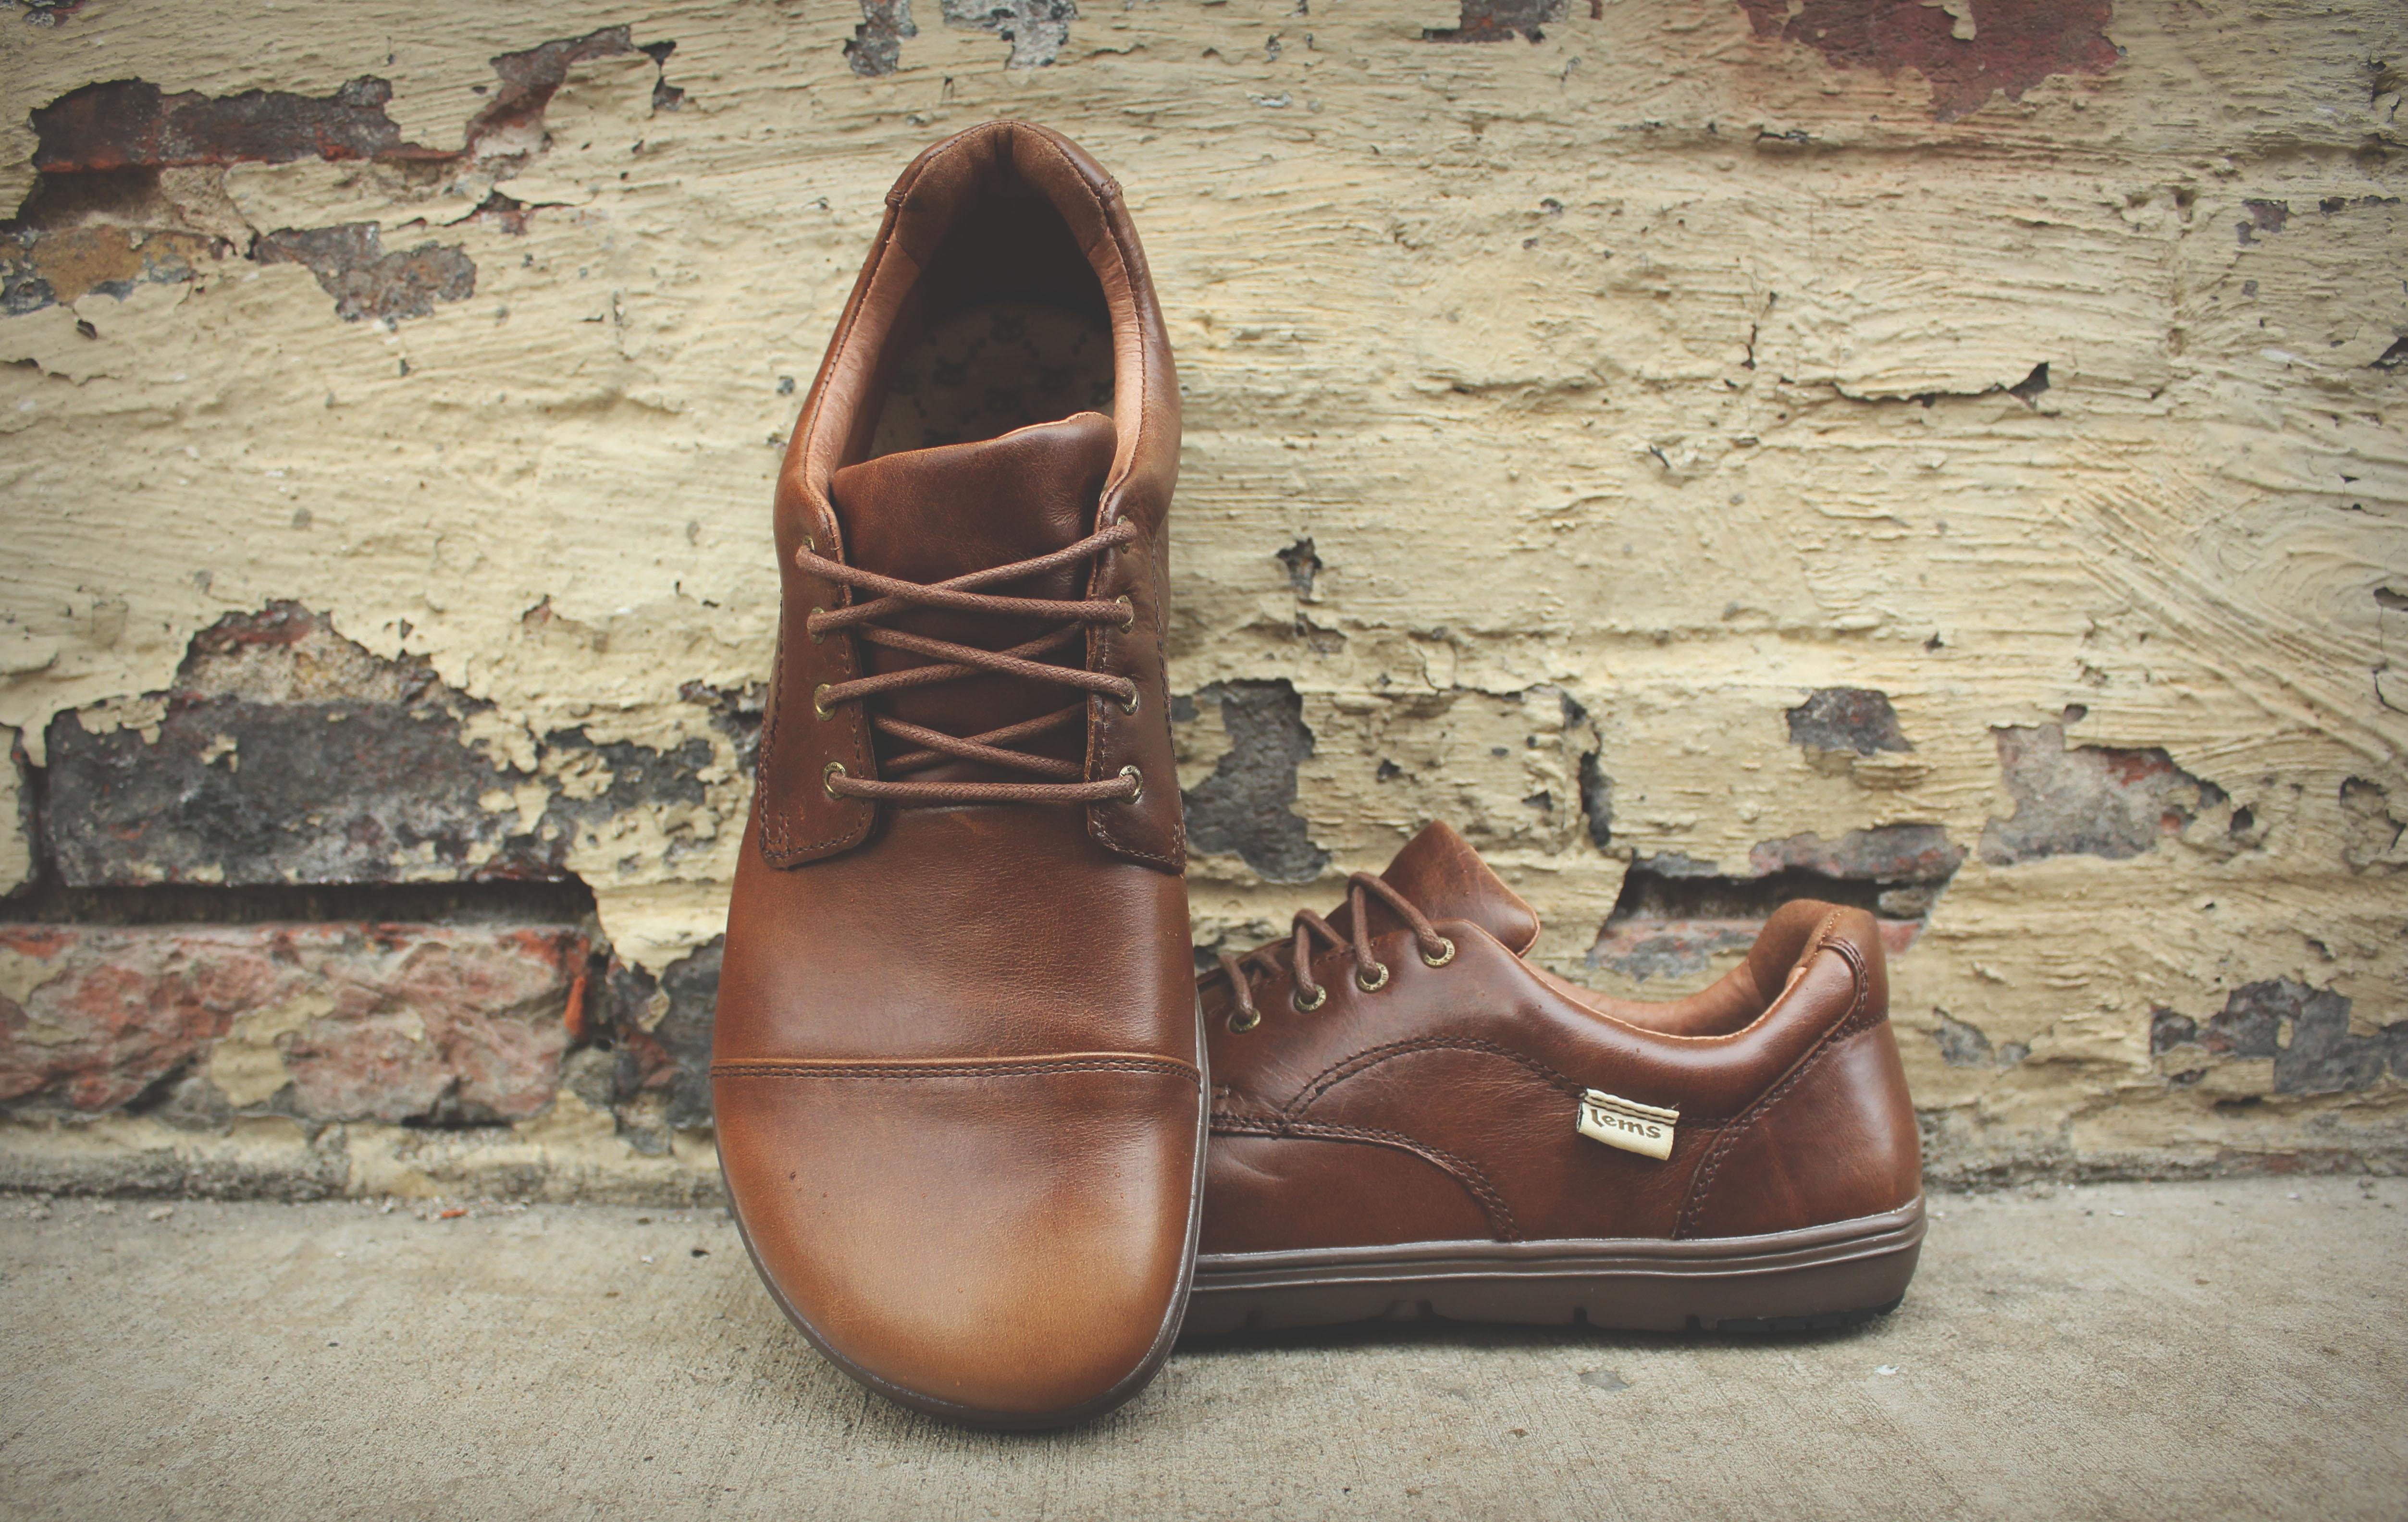 Lems Nine2five calzado minimalista